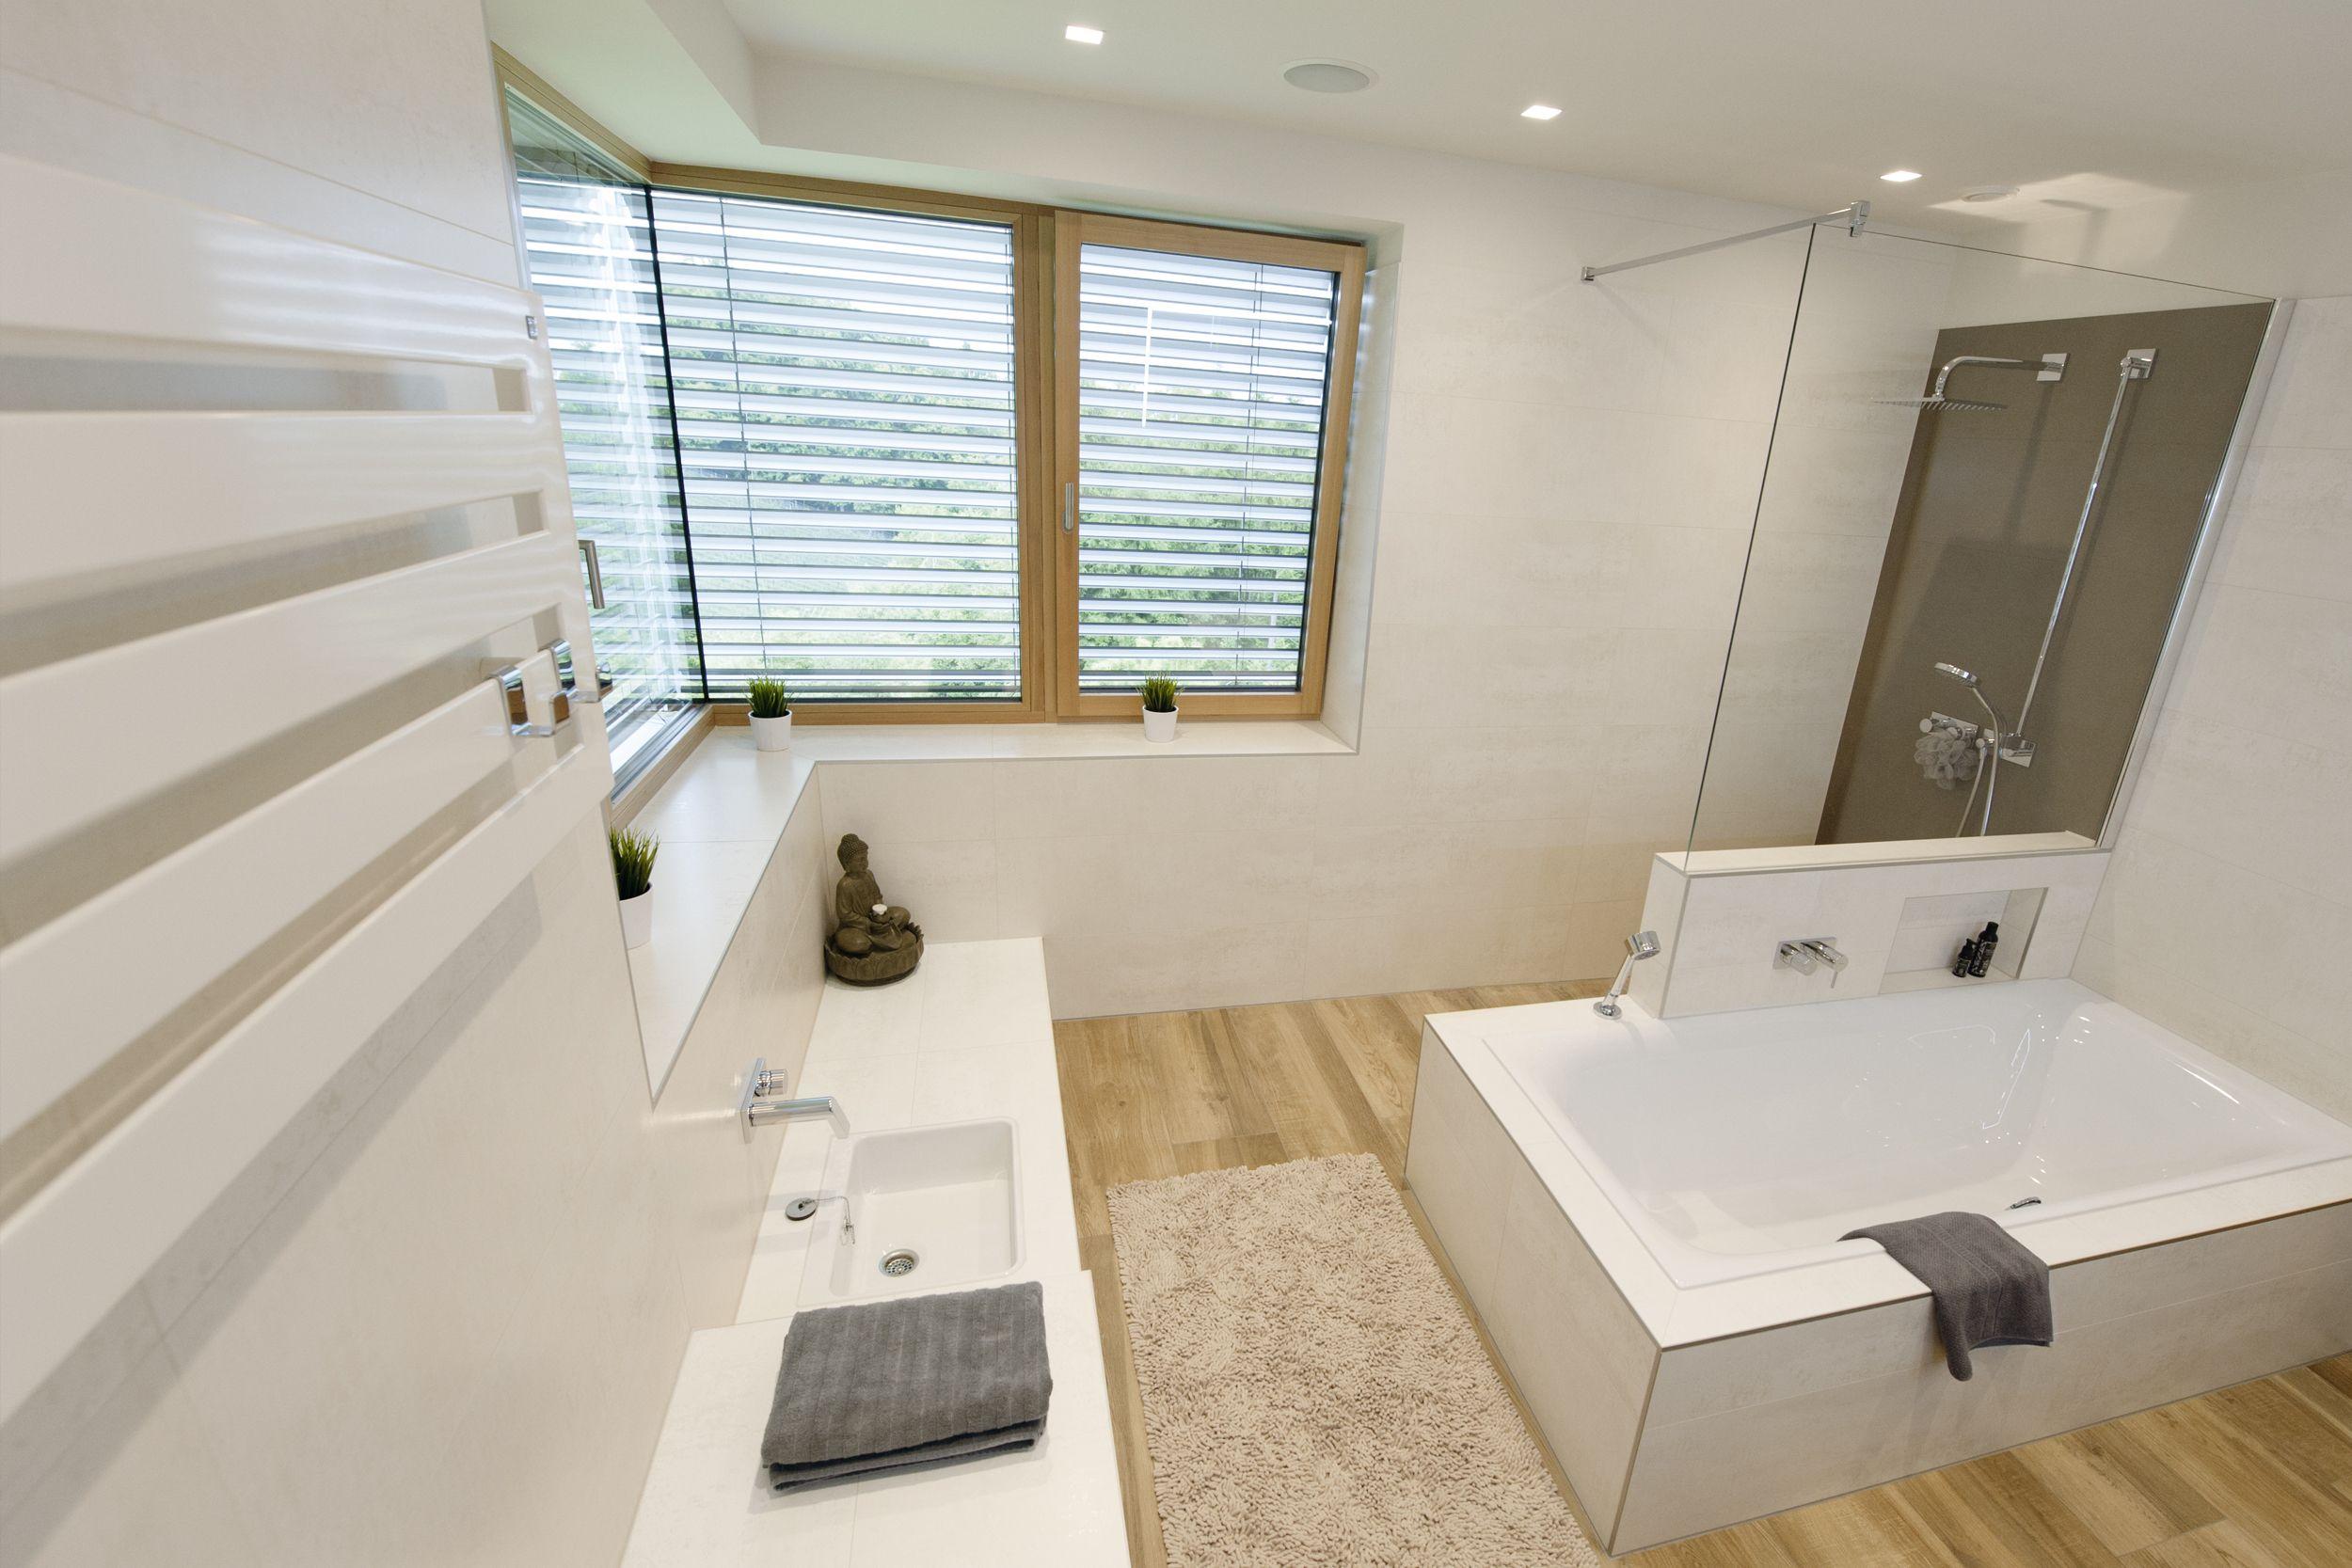 Badheizkörper mit Handtuchtrockner • modernes Lichtkonzept